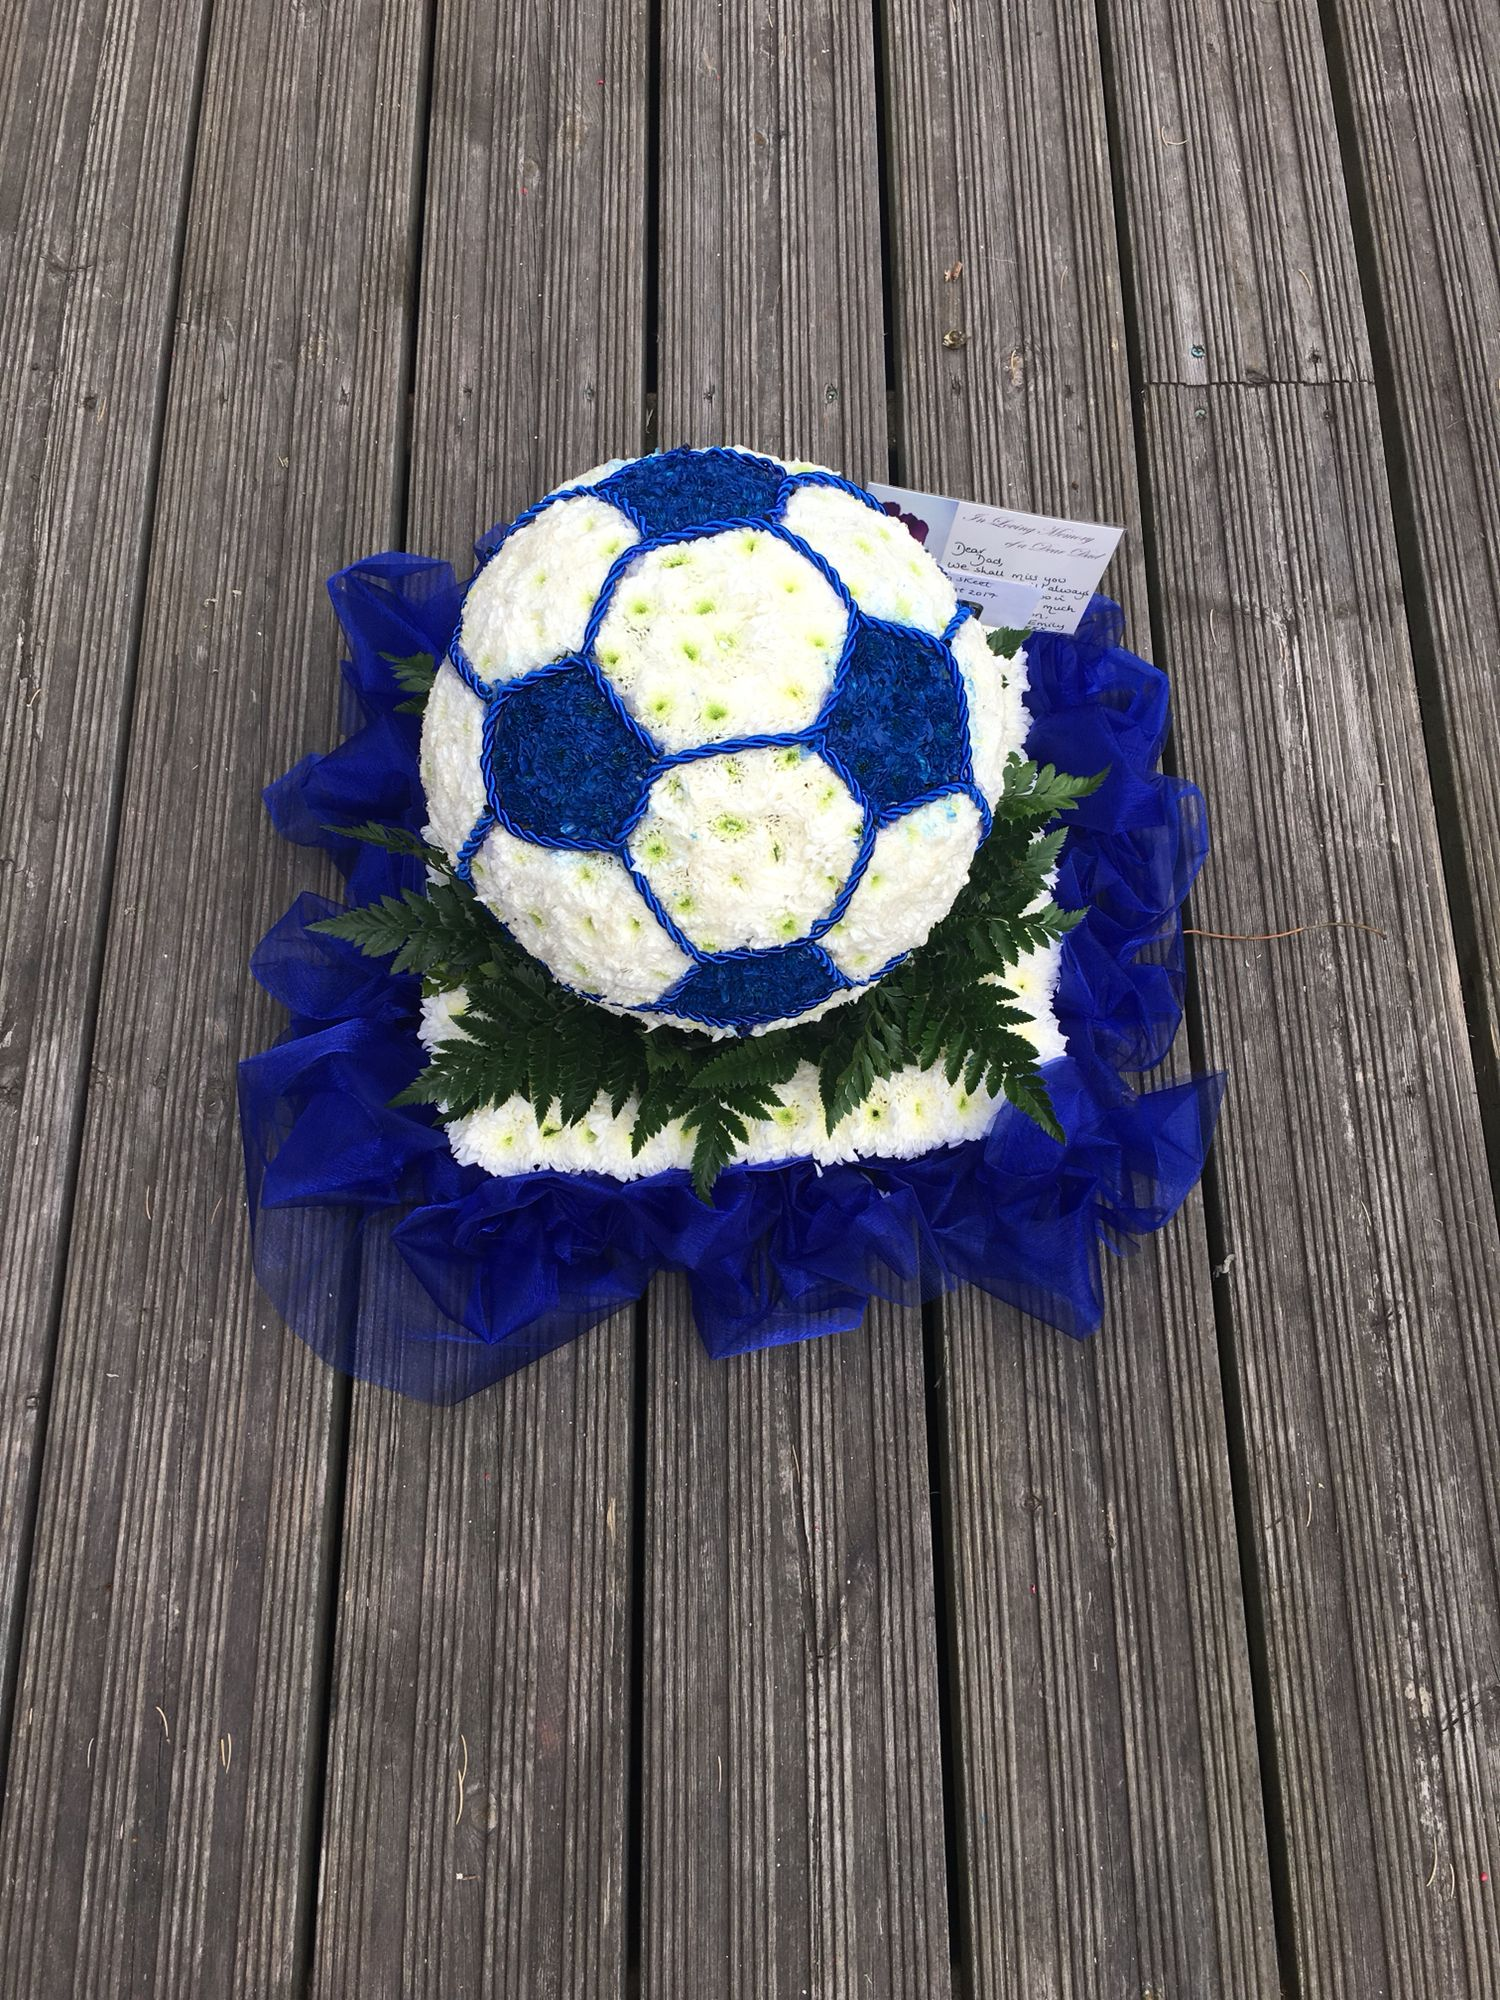 Football funeral tribute funeral flower tributes pinterest football funeral tribute izmirmasajfo